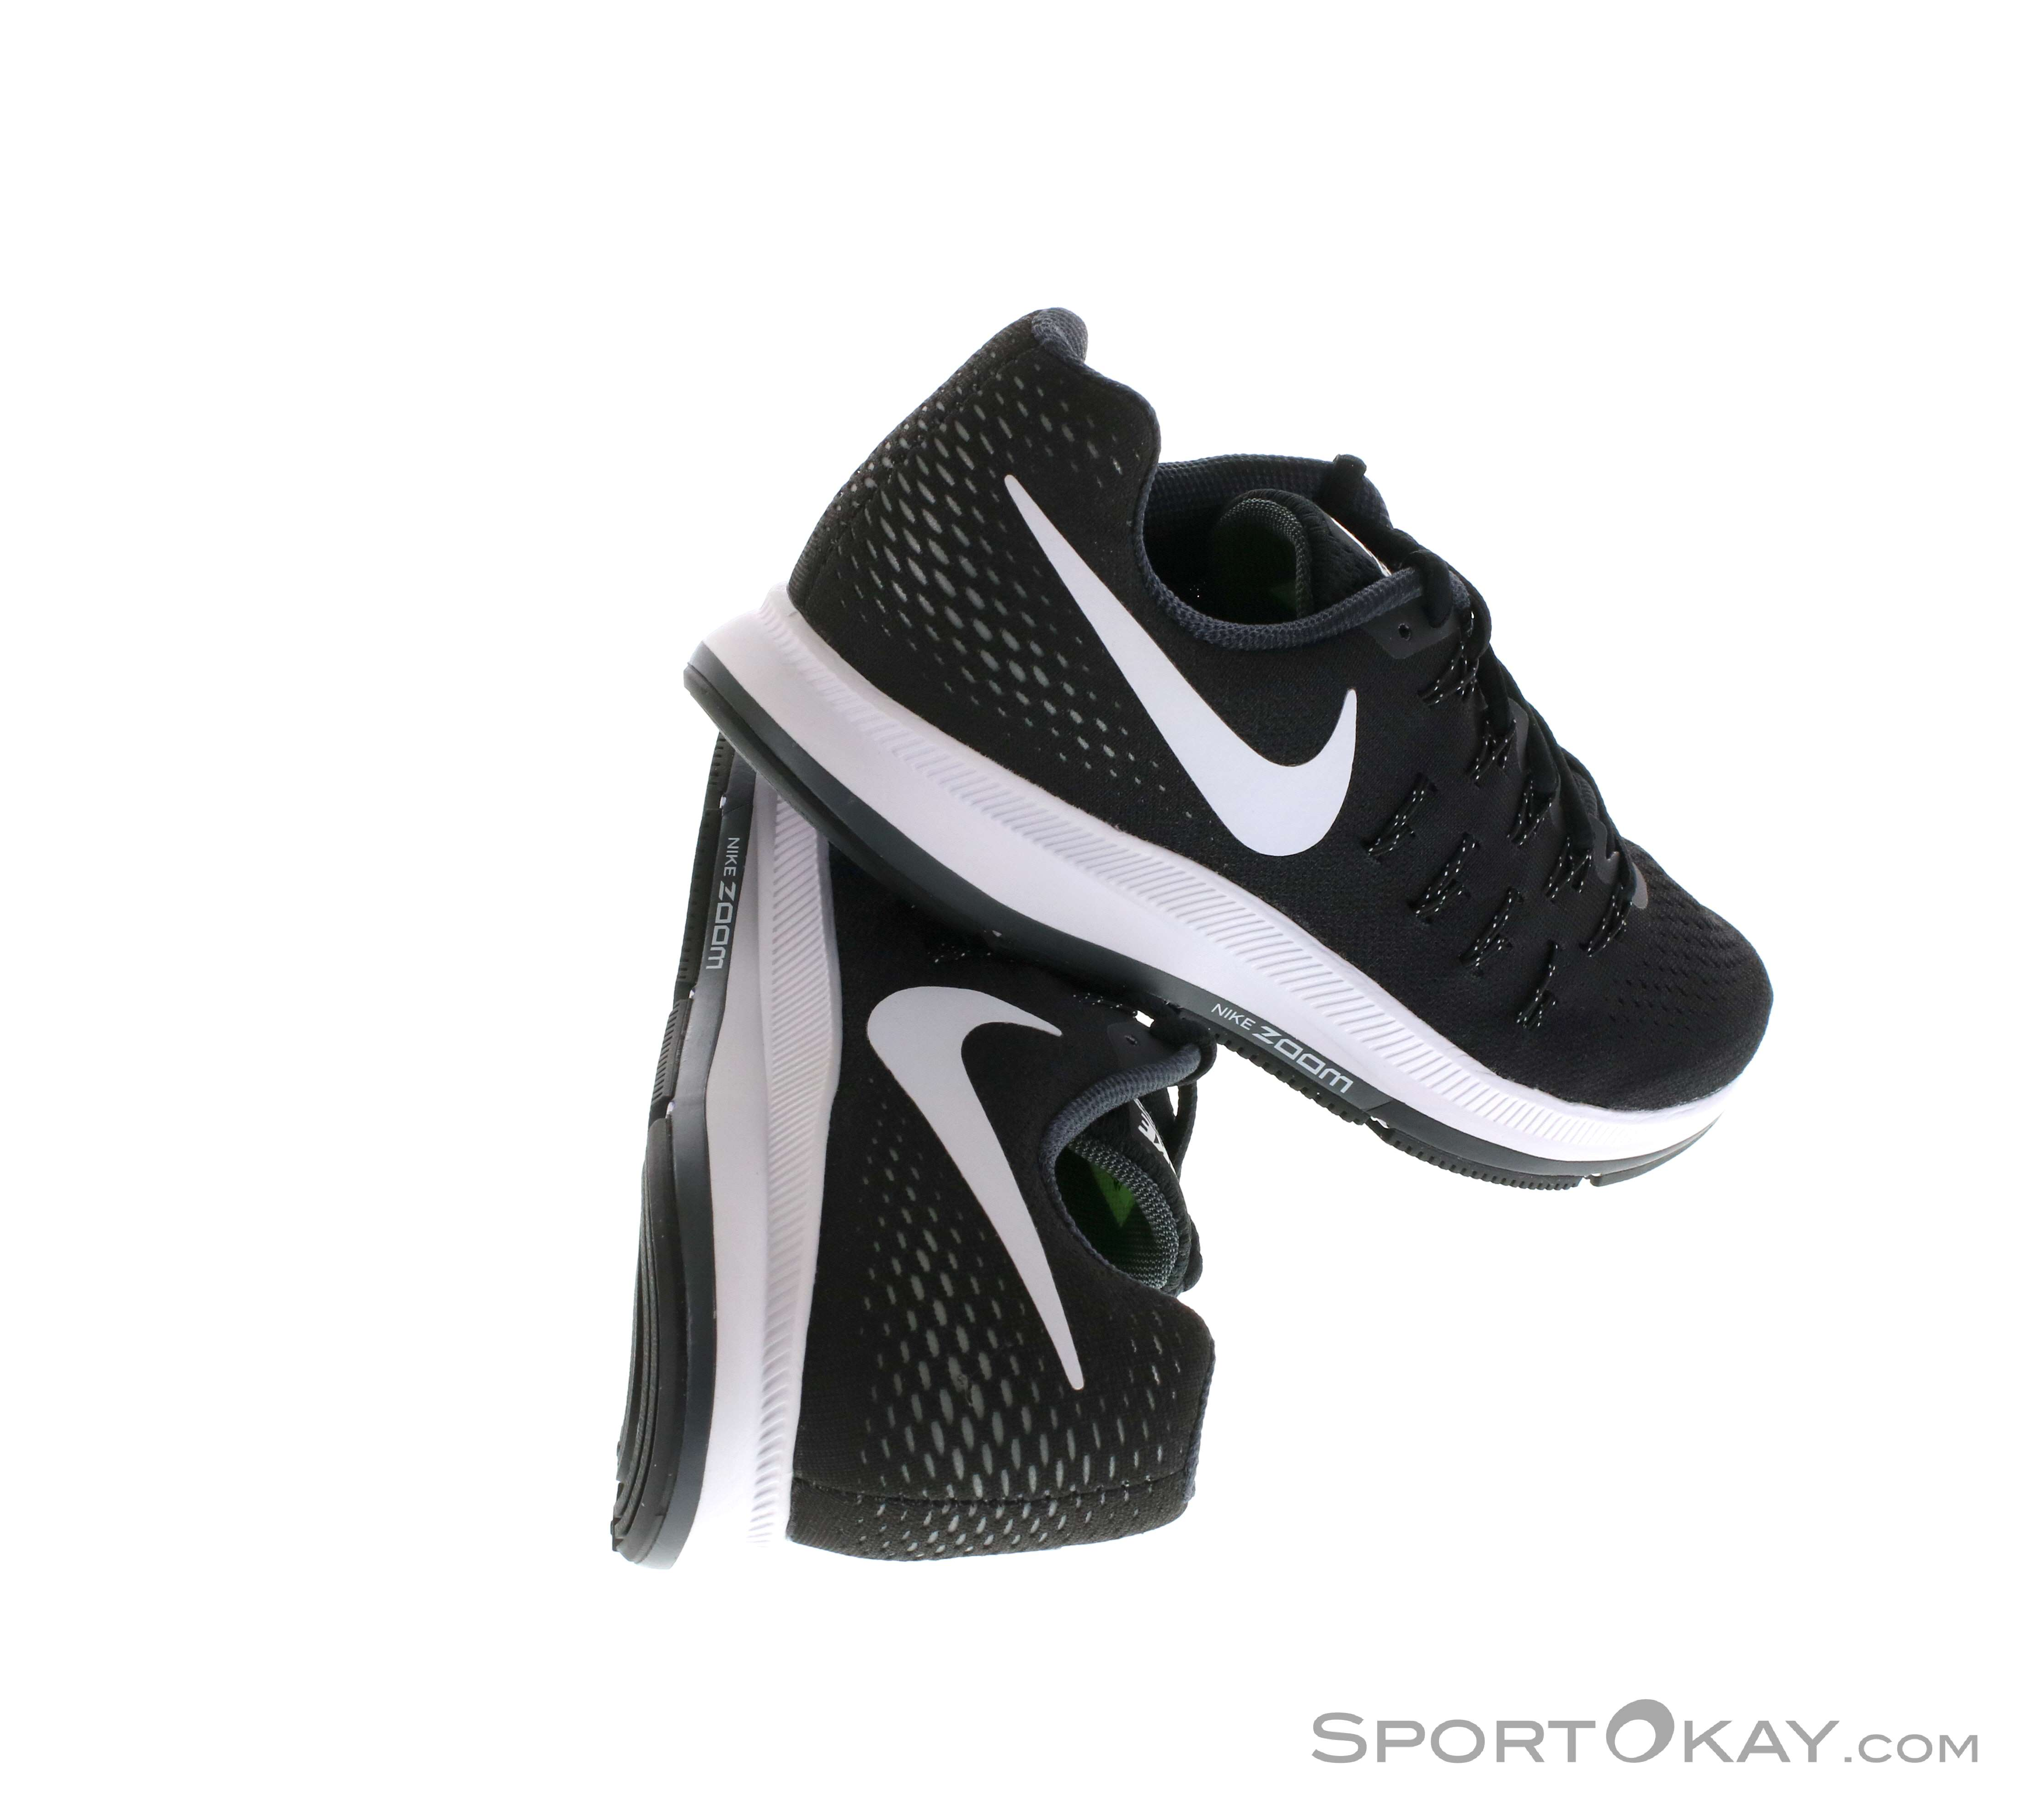 low priced 97b23 d79fb ... Nike Air Zoom Pegasus 33 Herren Laufschuhe, Nike, Schwarz, , Herren, ...